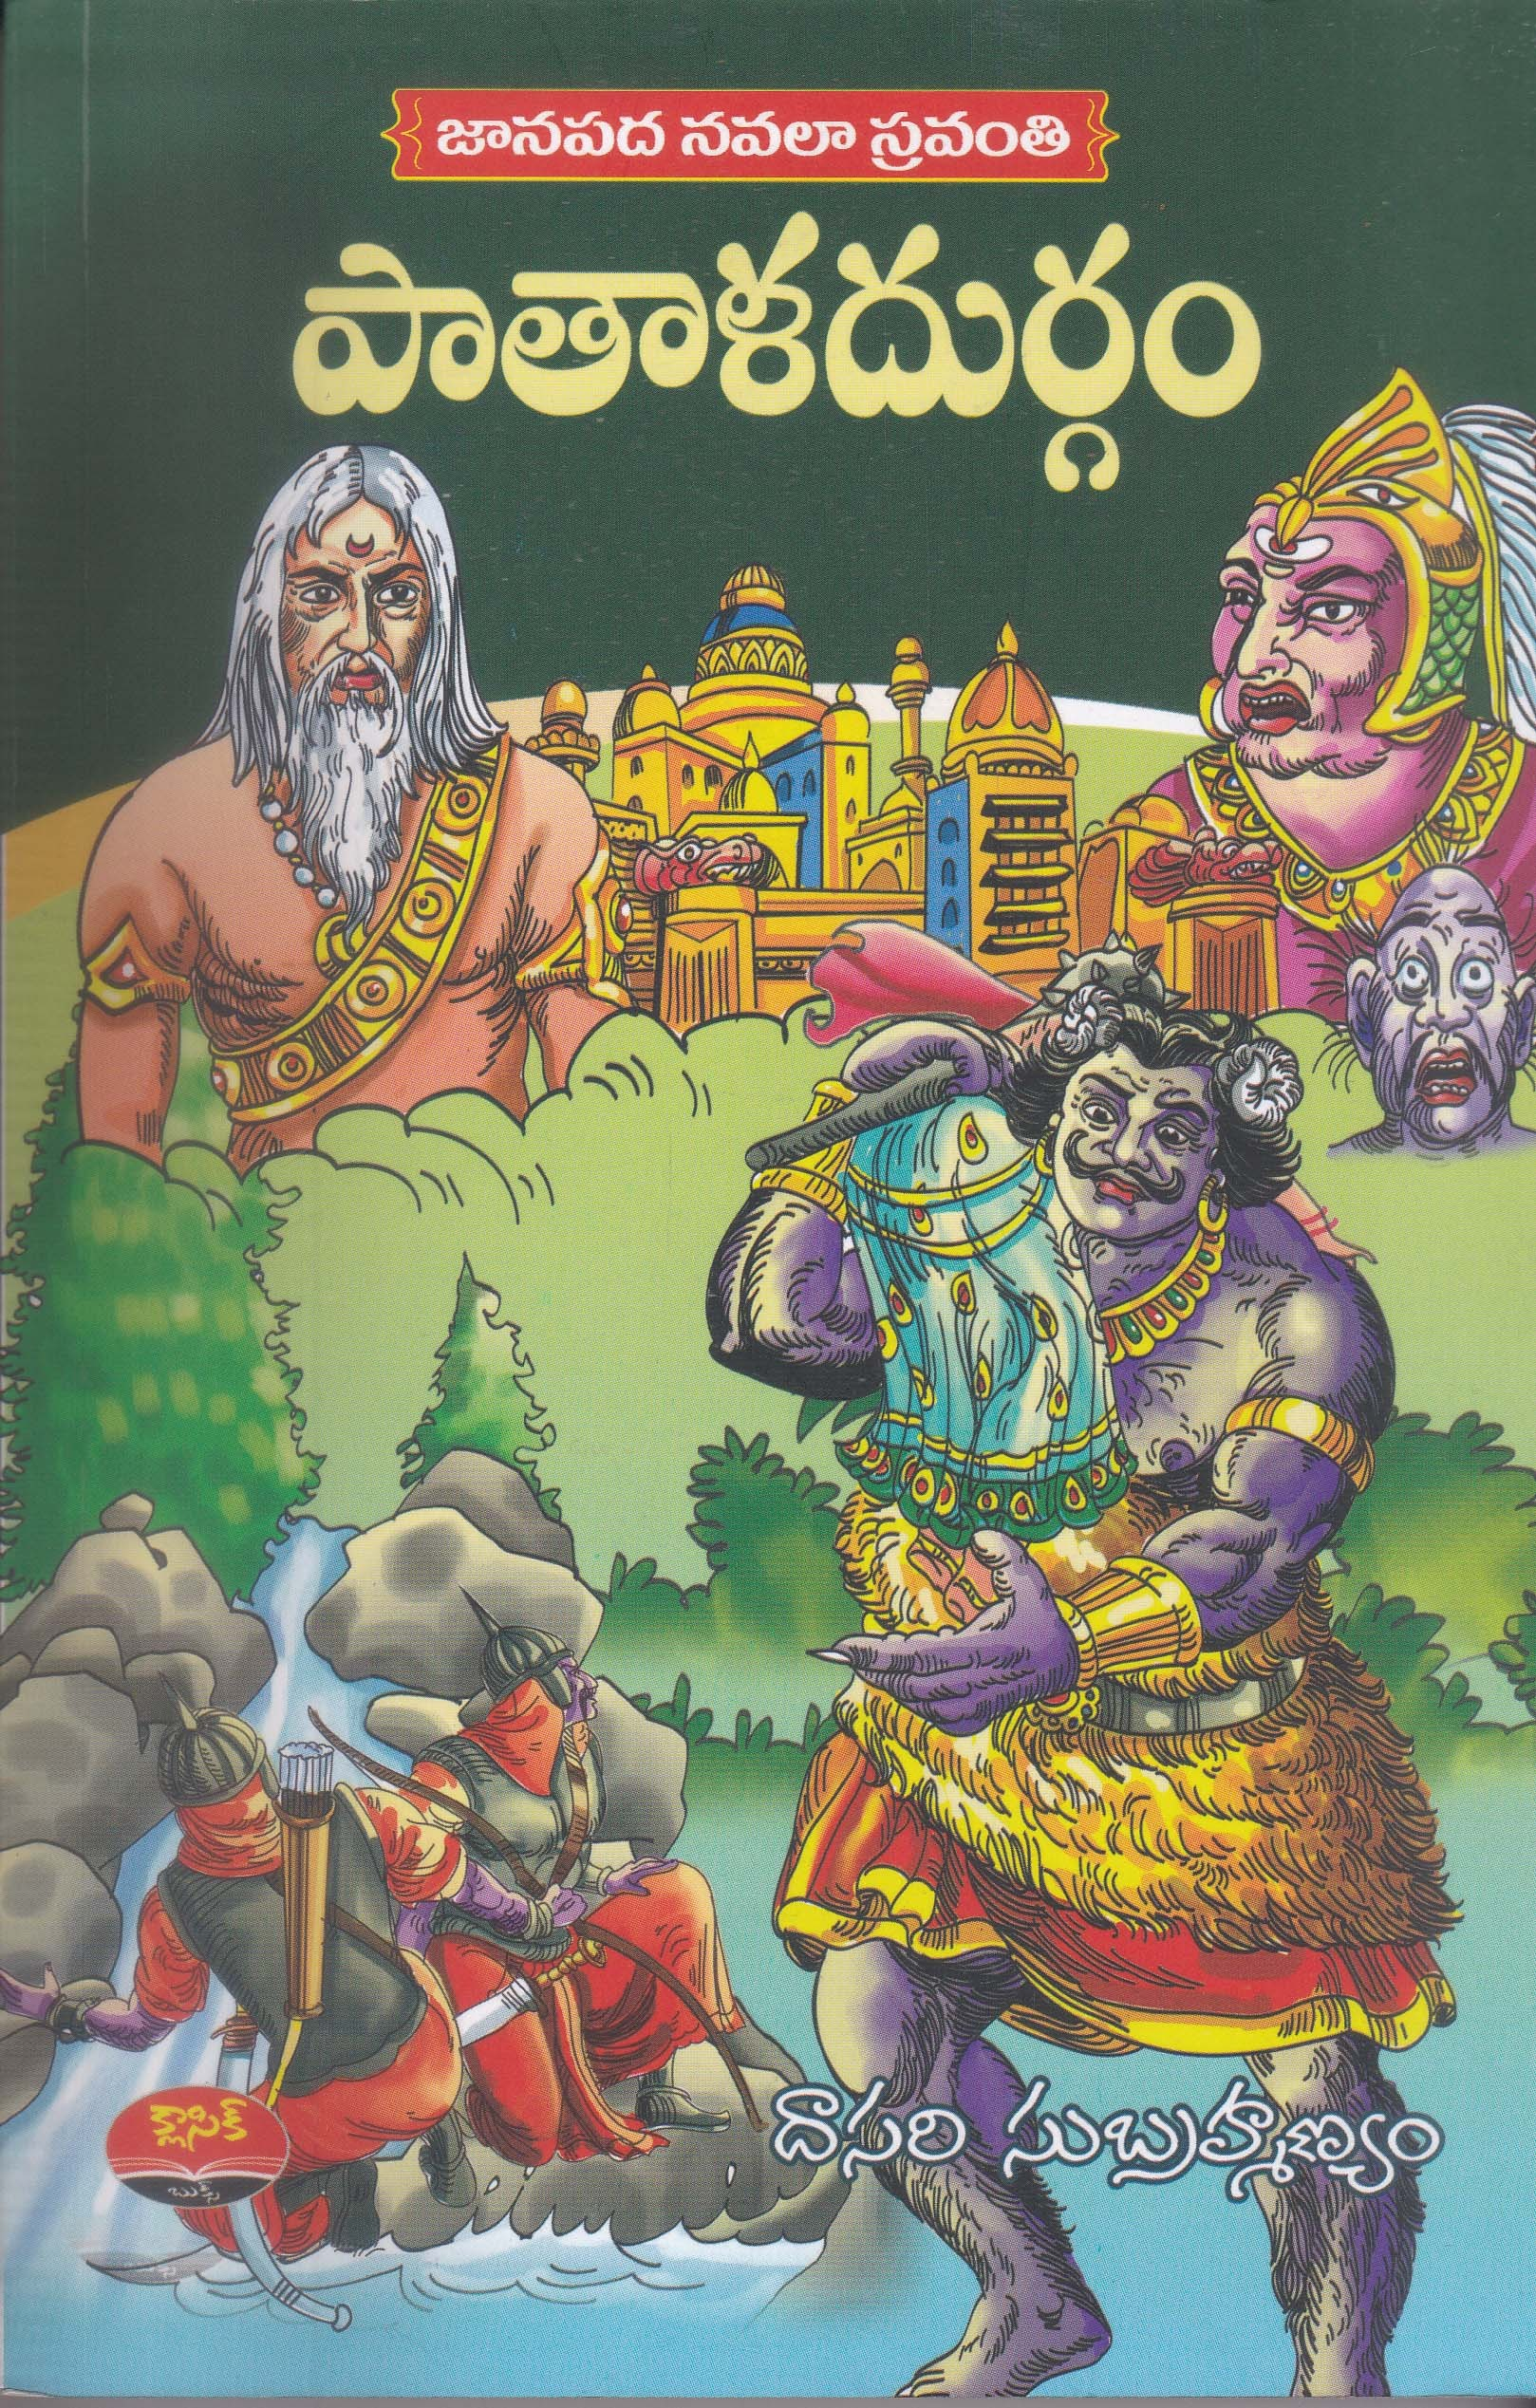 paathala-durgam-telugu-book-by-dasari-subrahmanyam